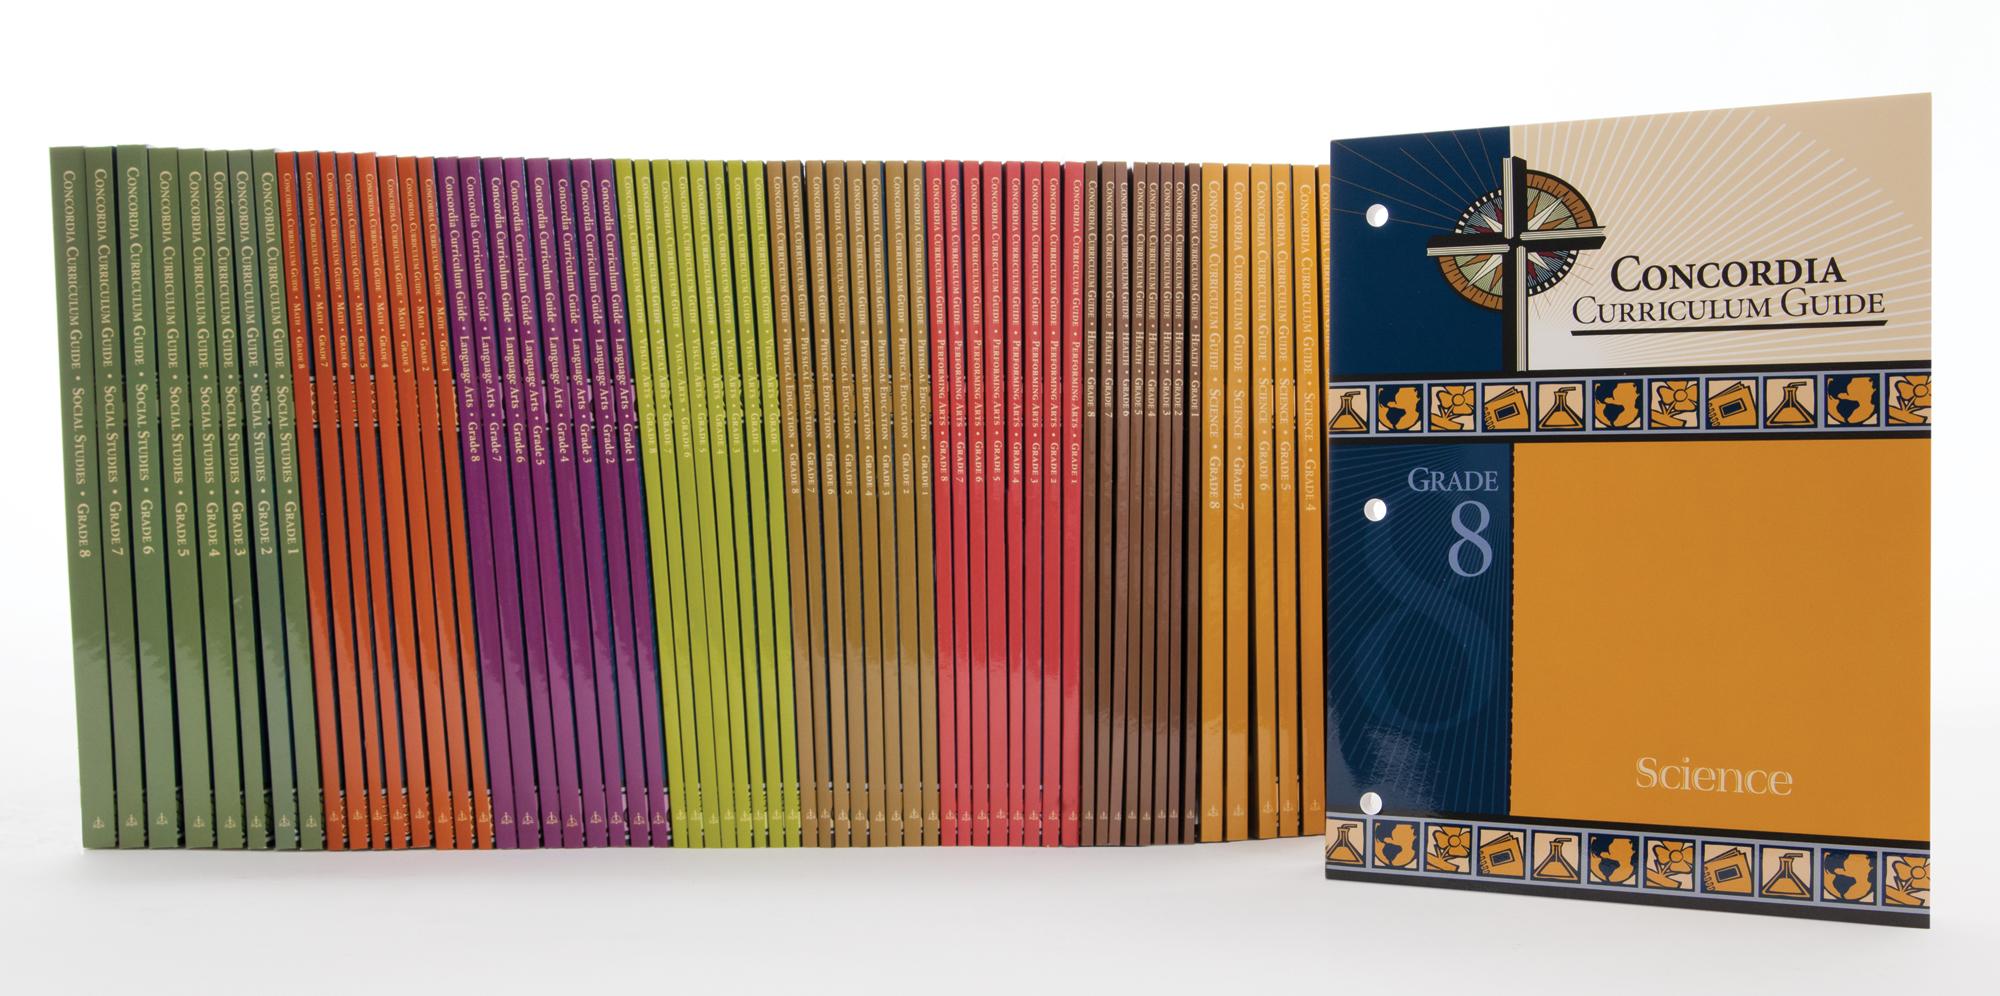 Concordia Curriculum Guide:L Grades 1-8 All Subject Set